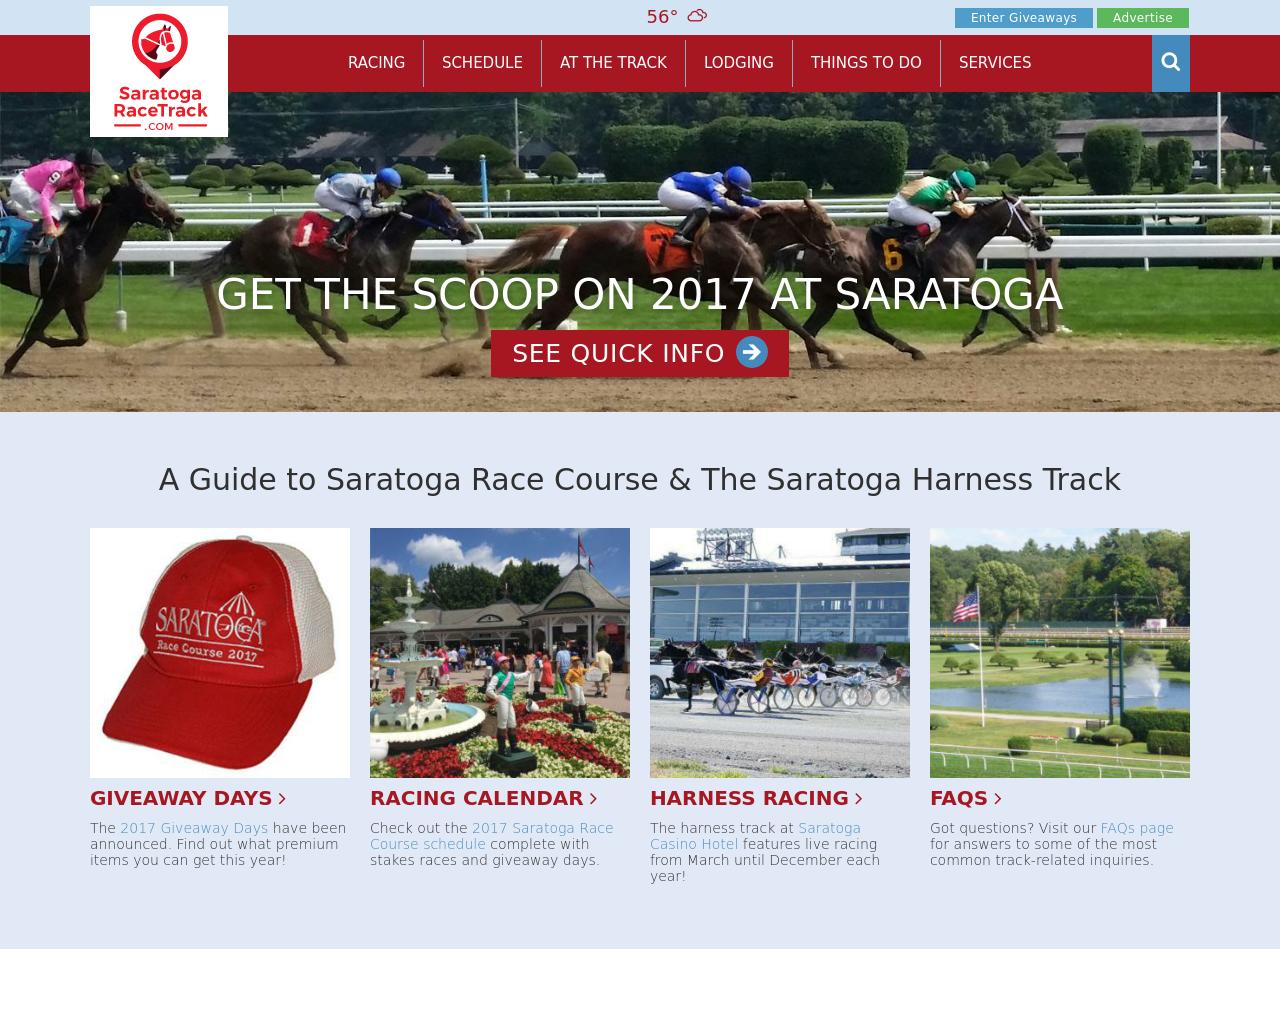 SaratogaRacetrack.com-Advertising-Reviews-Pricing